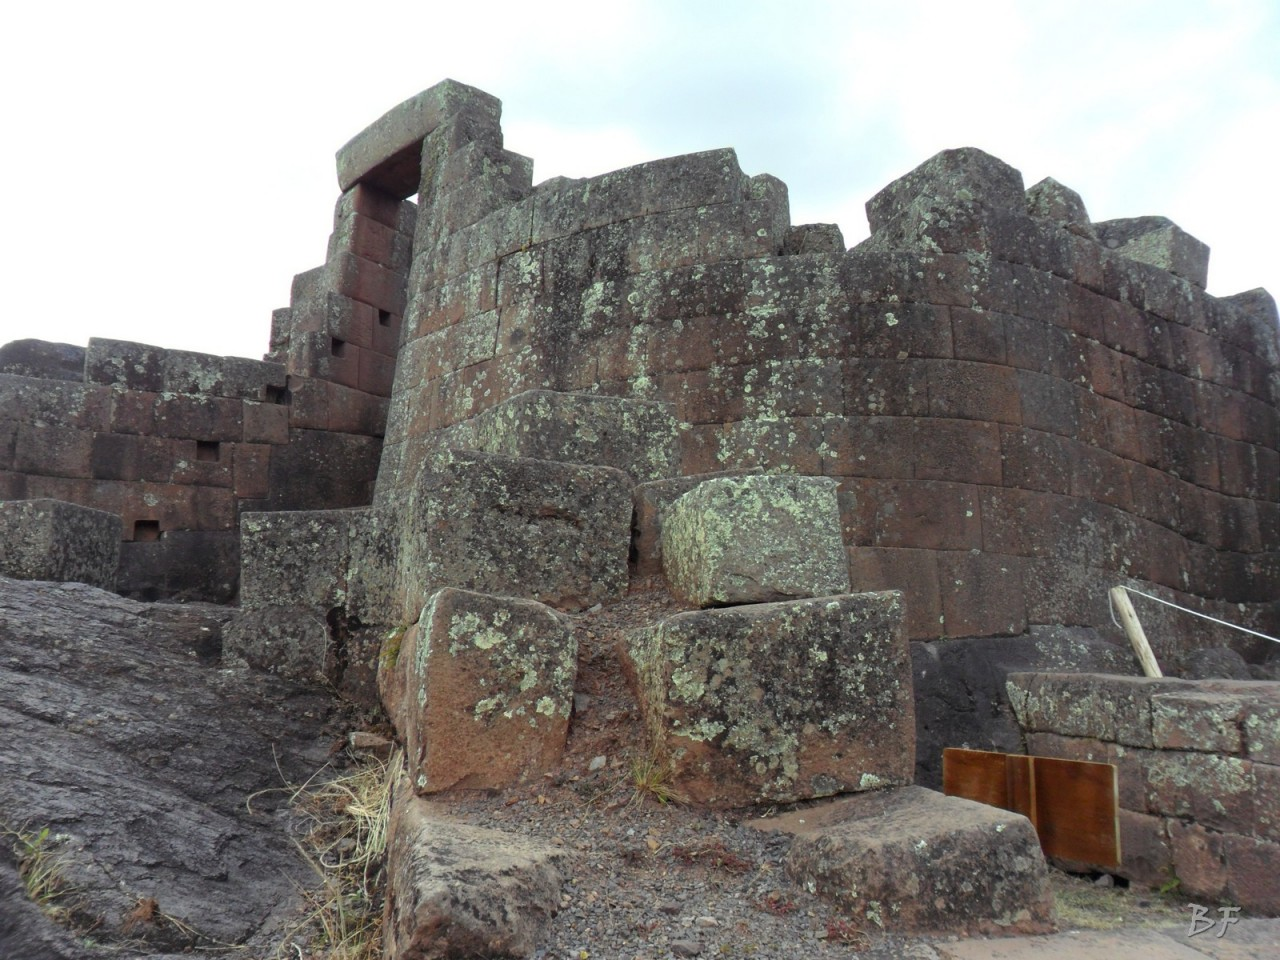 Mura-Poligonali-Megaliti-Altari-Rupestri-Pisac-Cusco-Perù-59